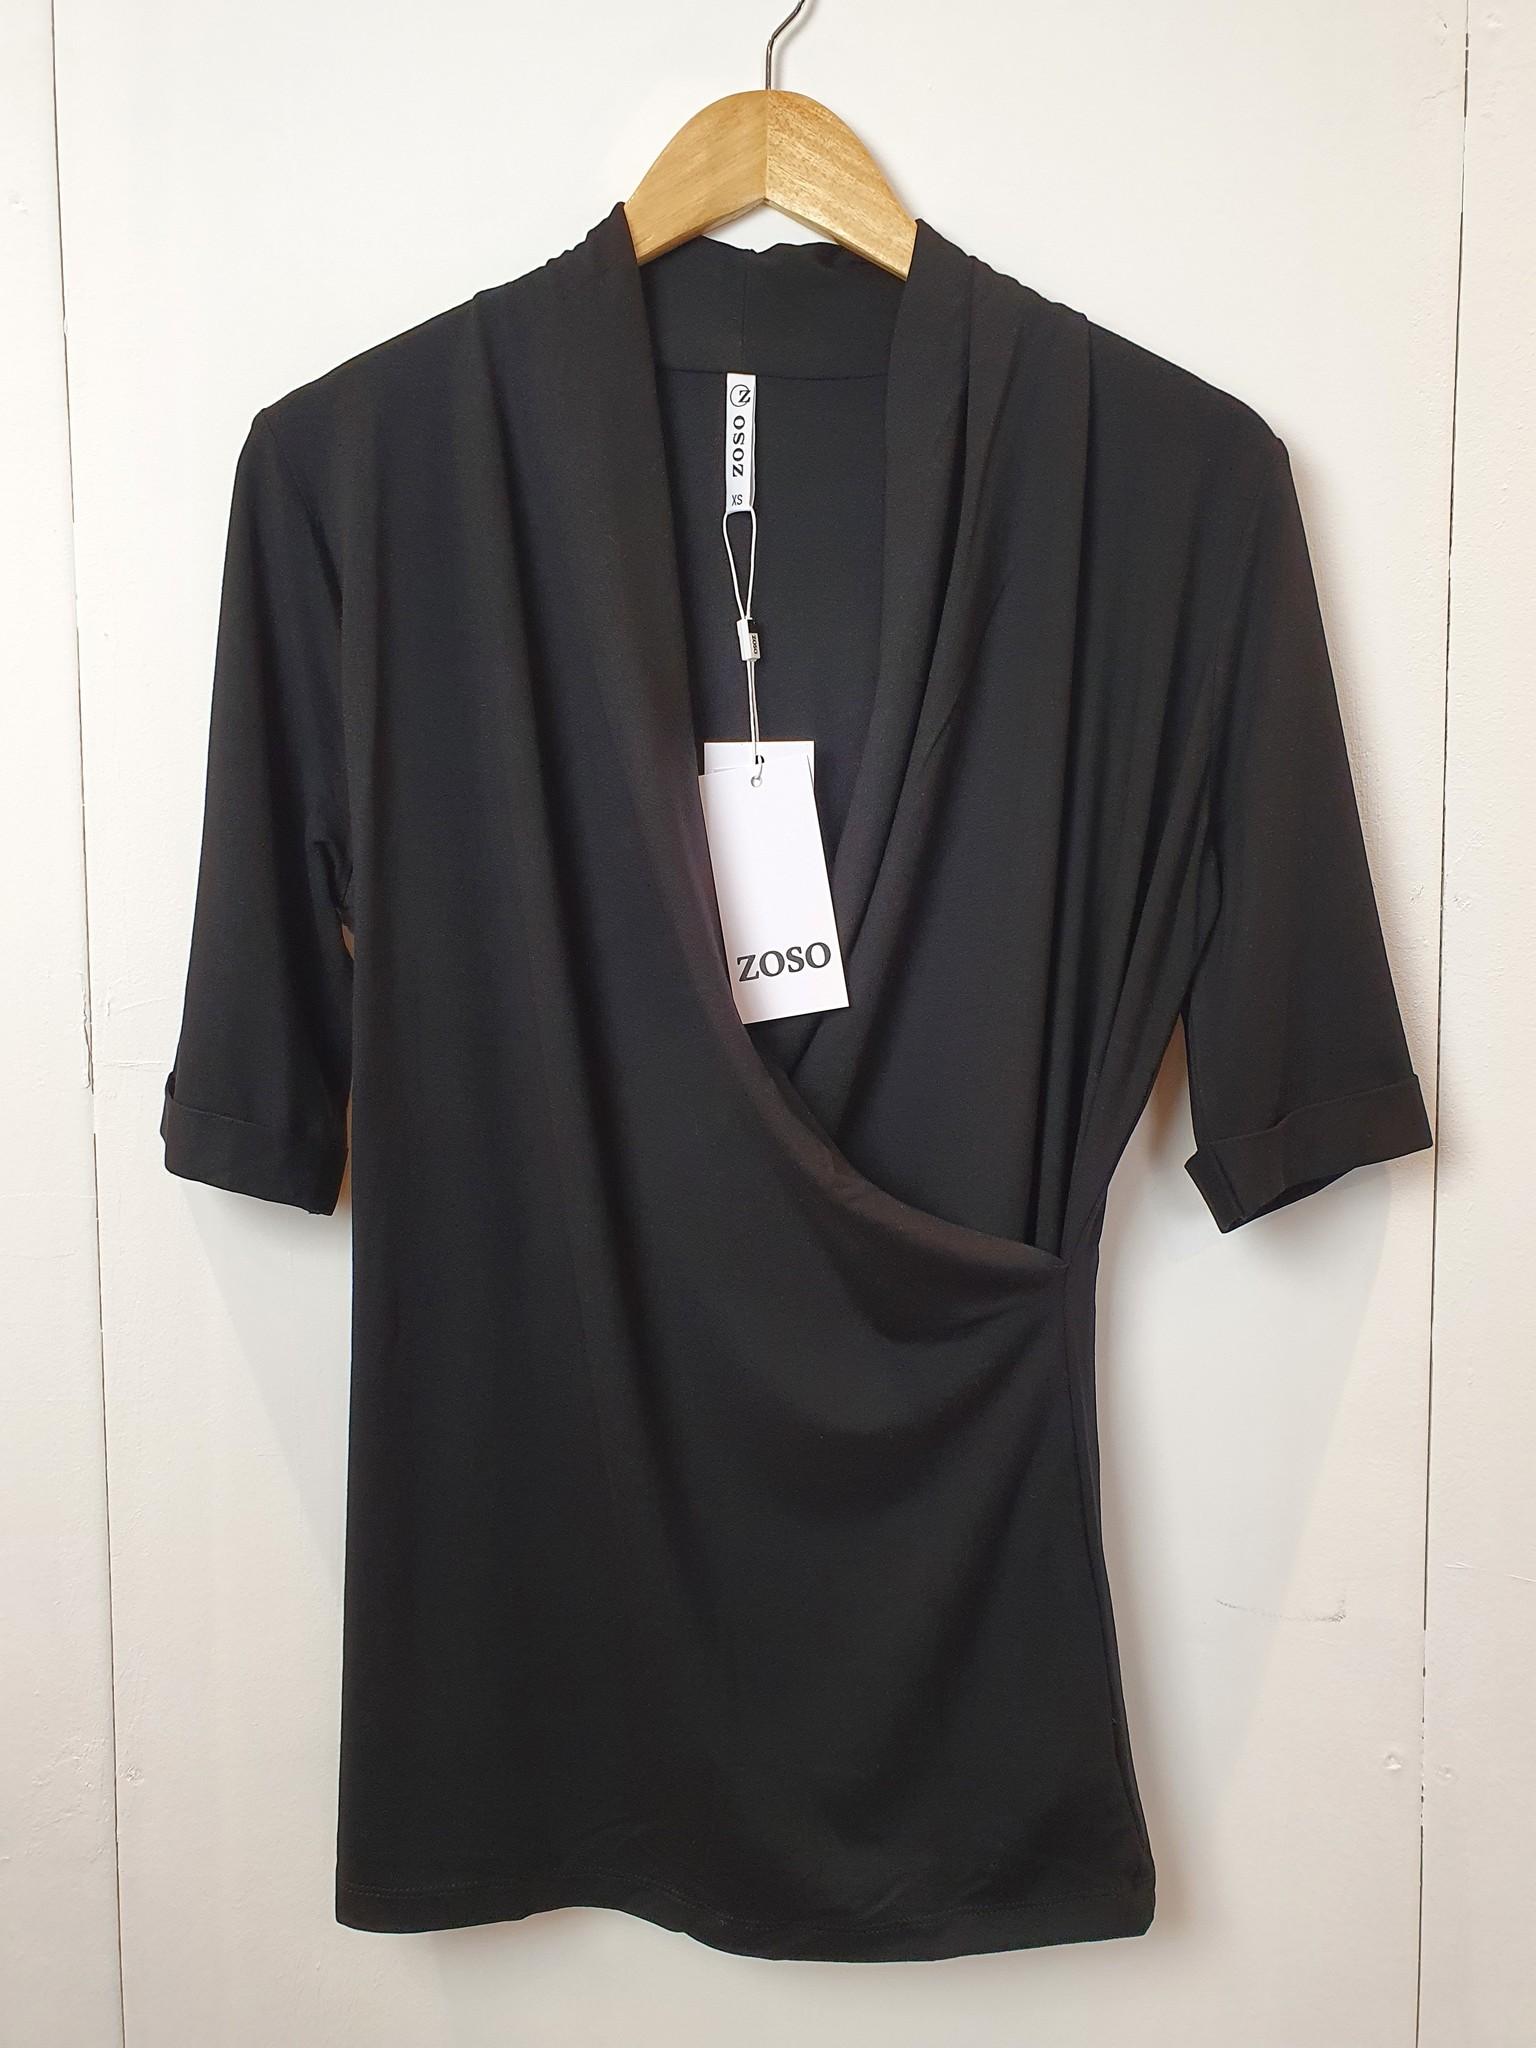 Zoso Zoso Dana Luxury viscose blouse black